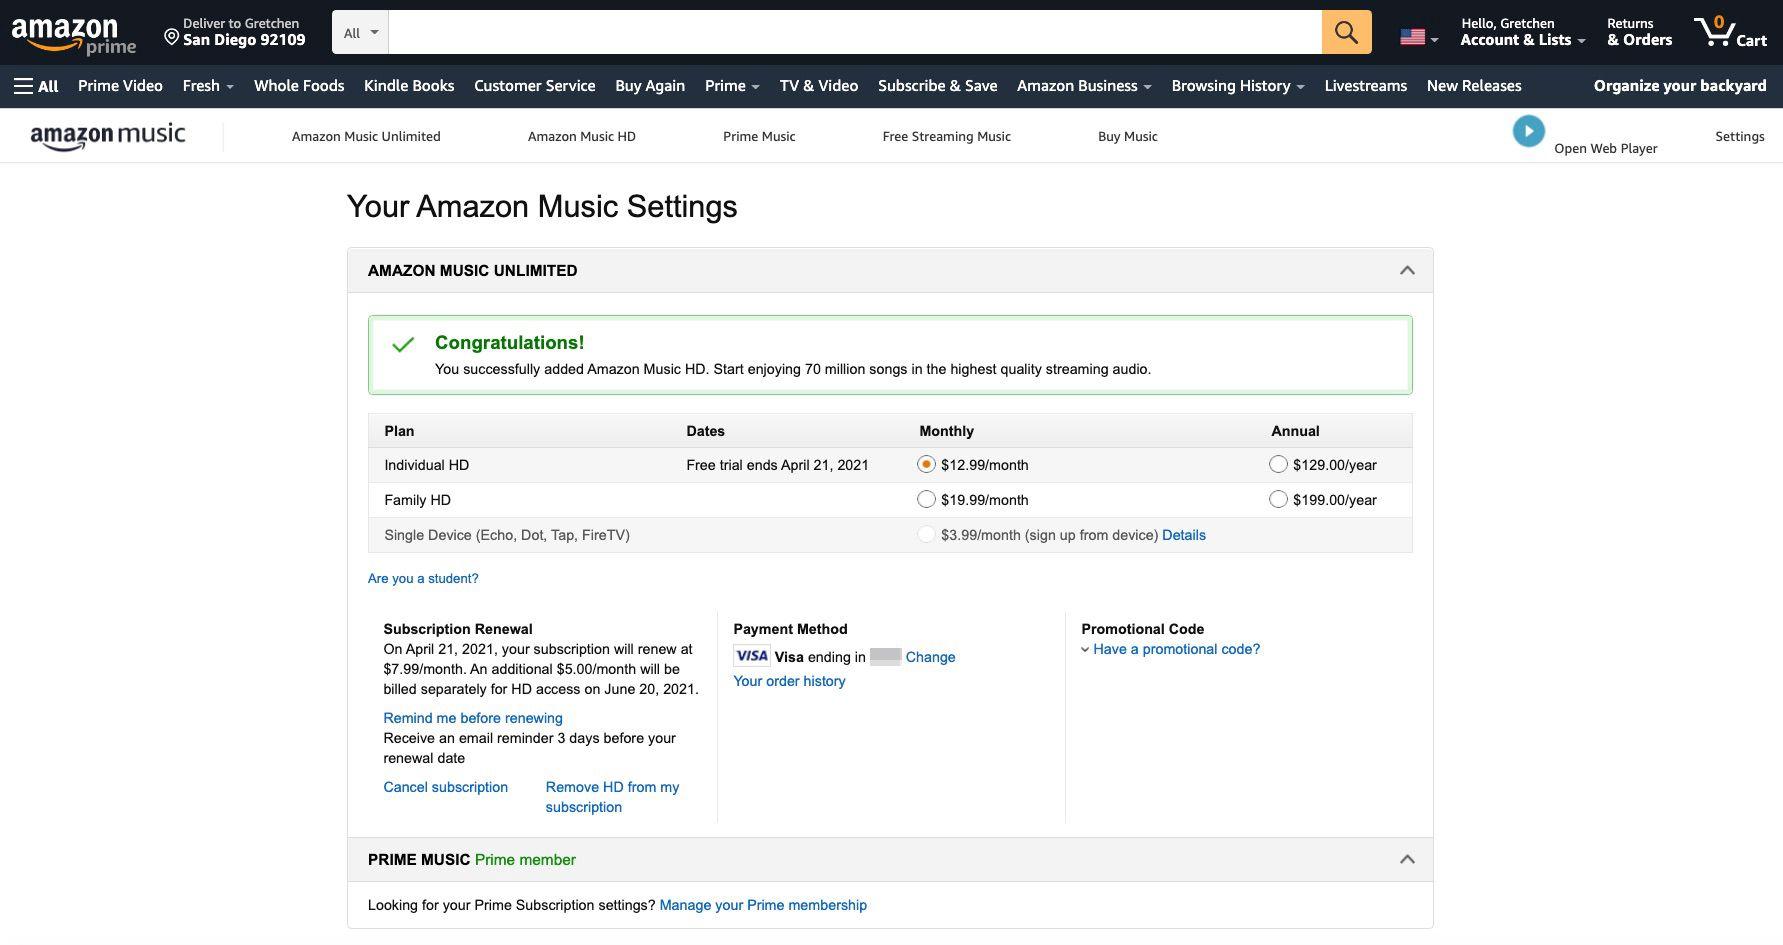 Amazon Music confirming a Music HD subscription